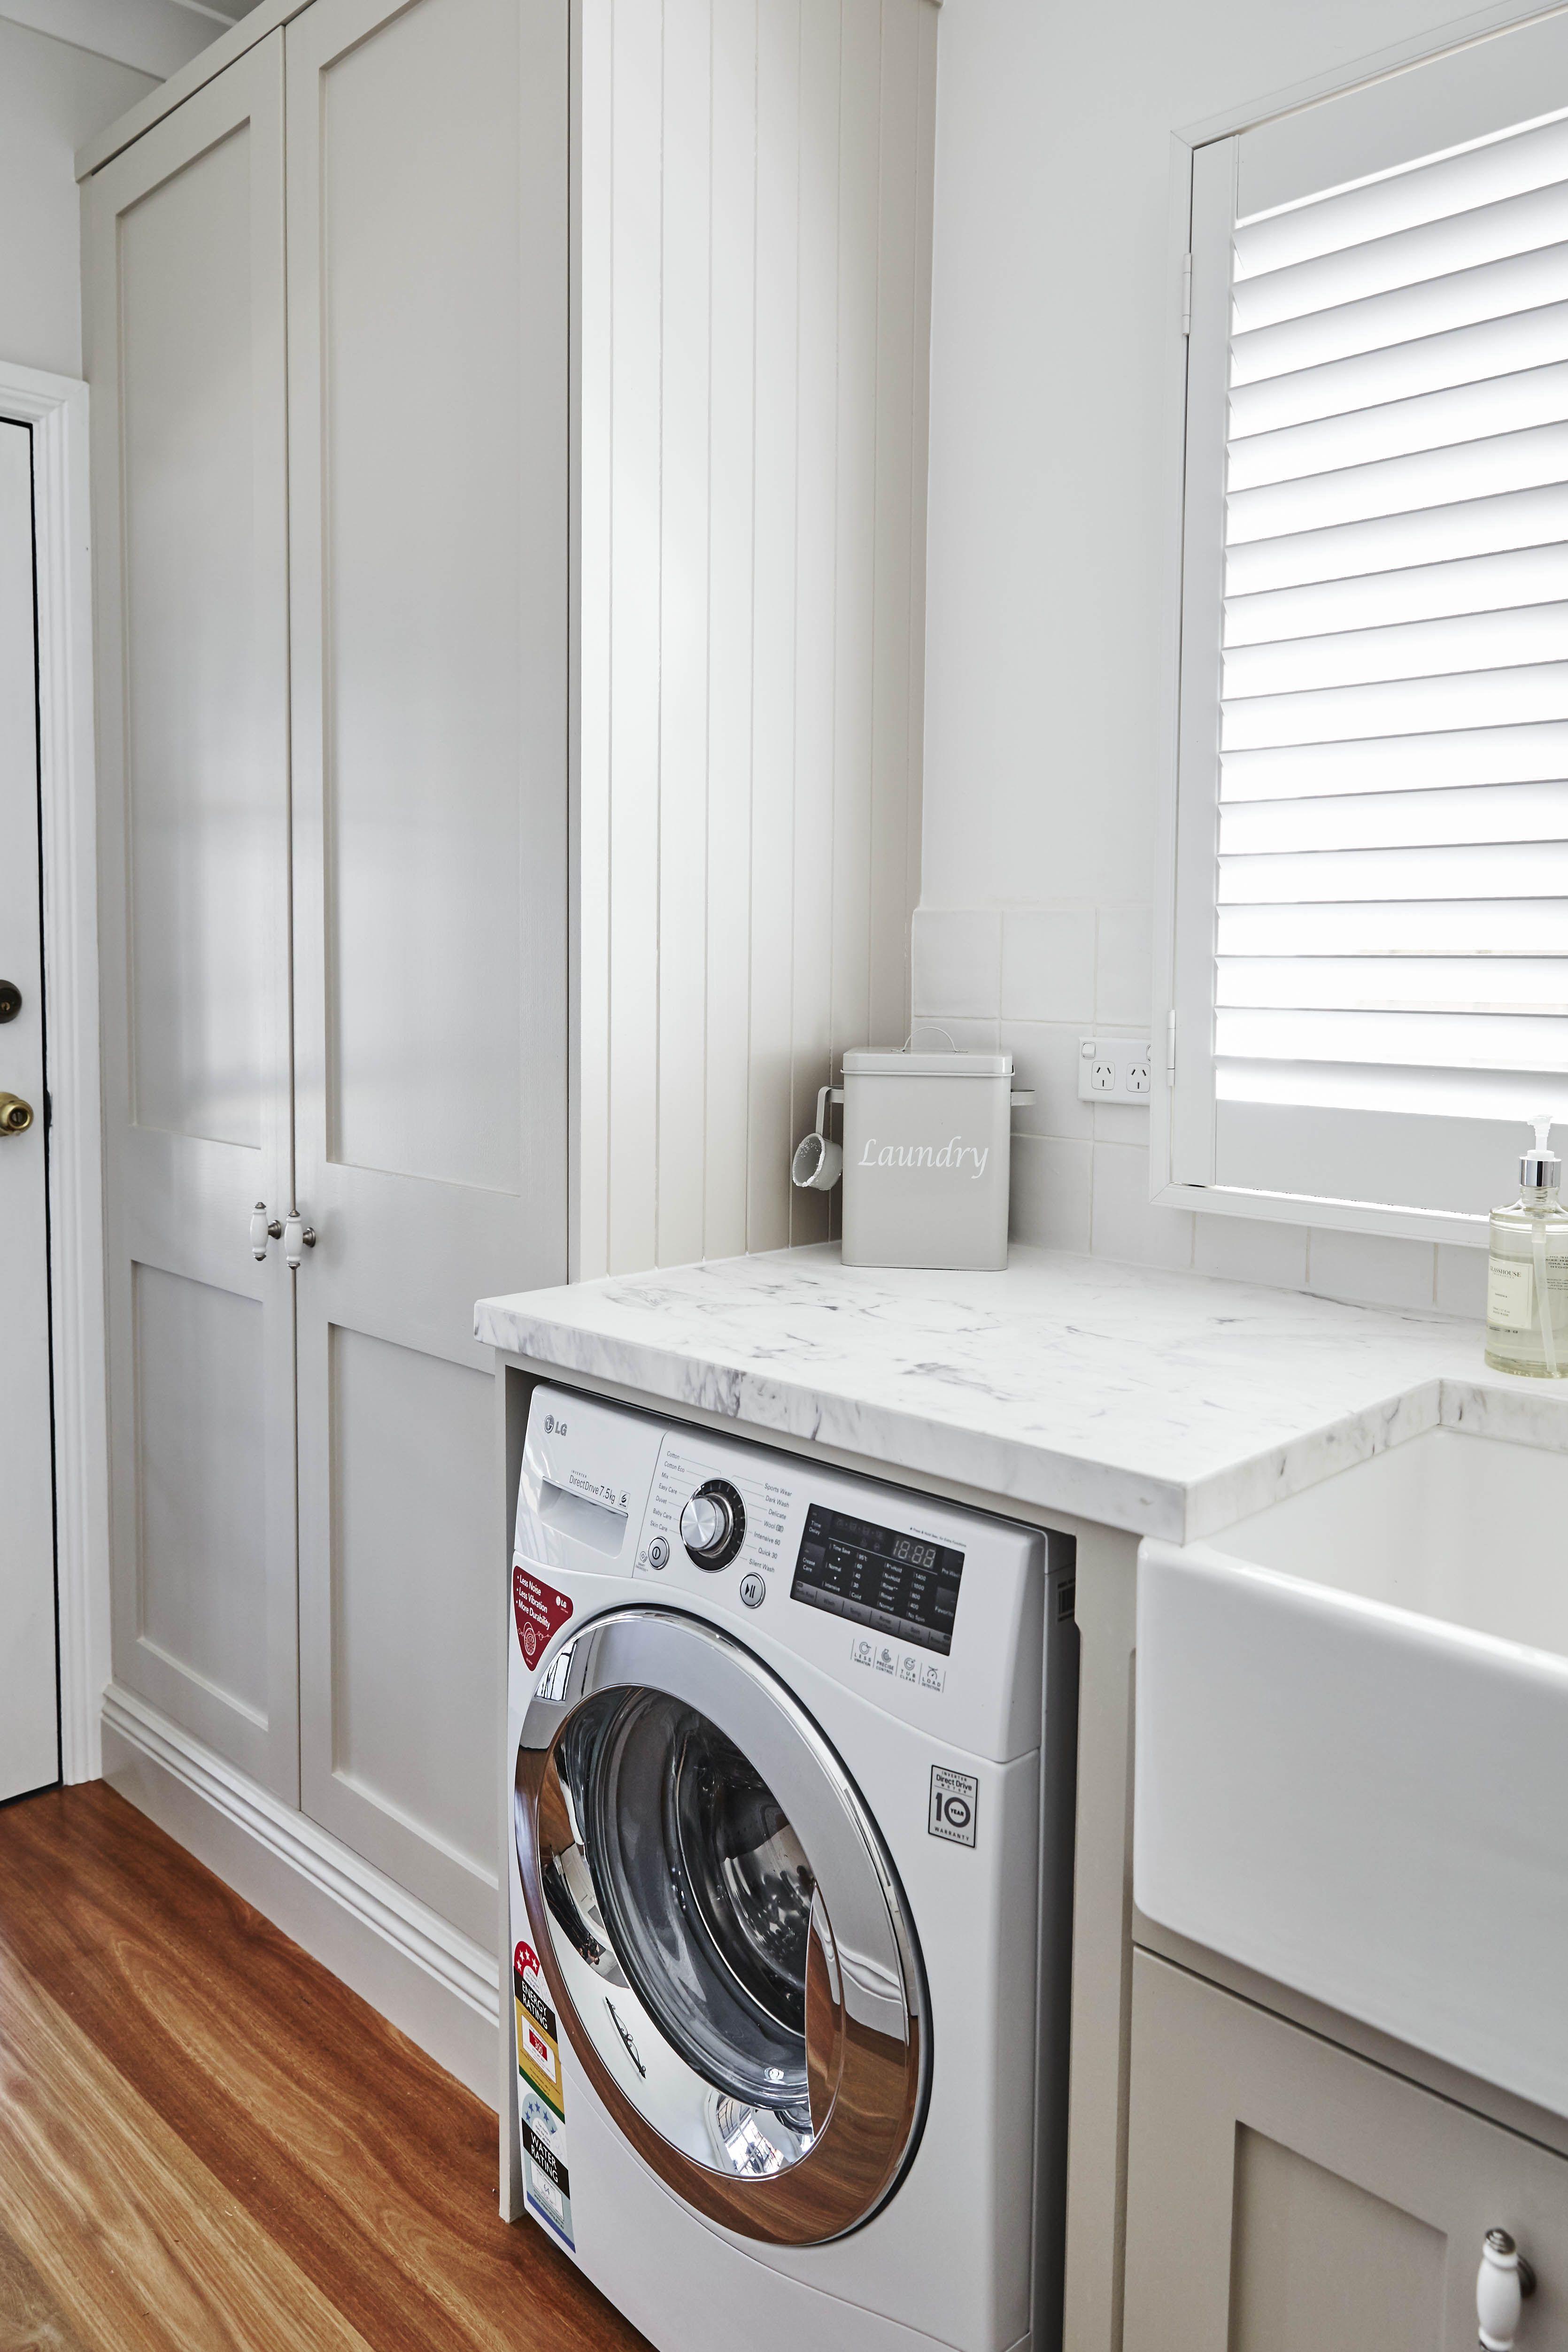 Provincial Kitchens Laundries Laundry, Laundry design